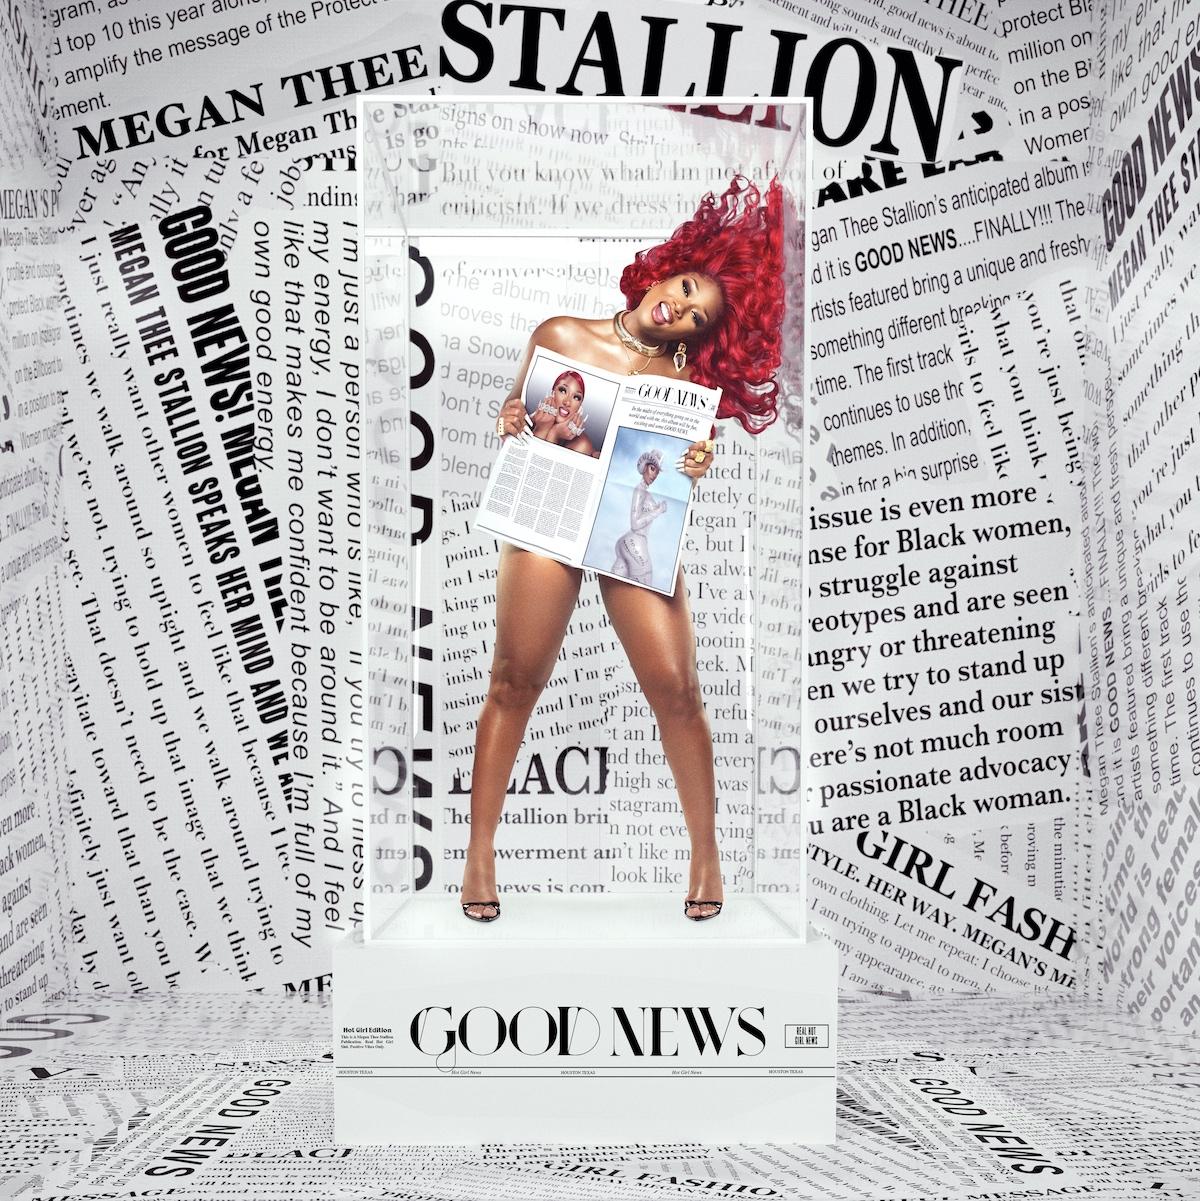 megan thee stallion good news debut album cover artwork